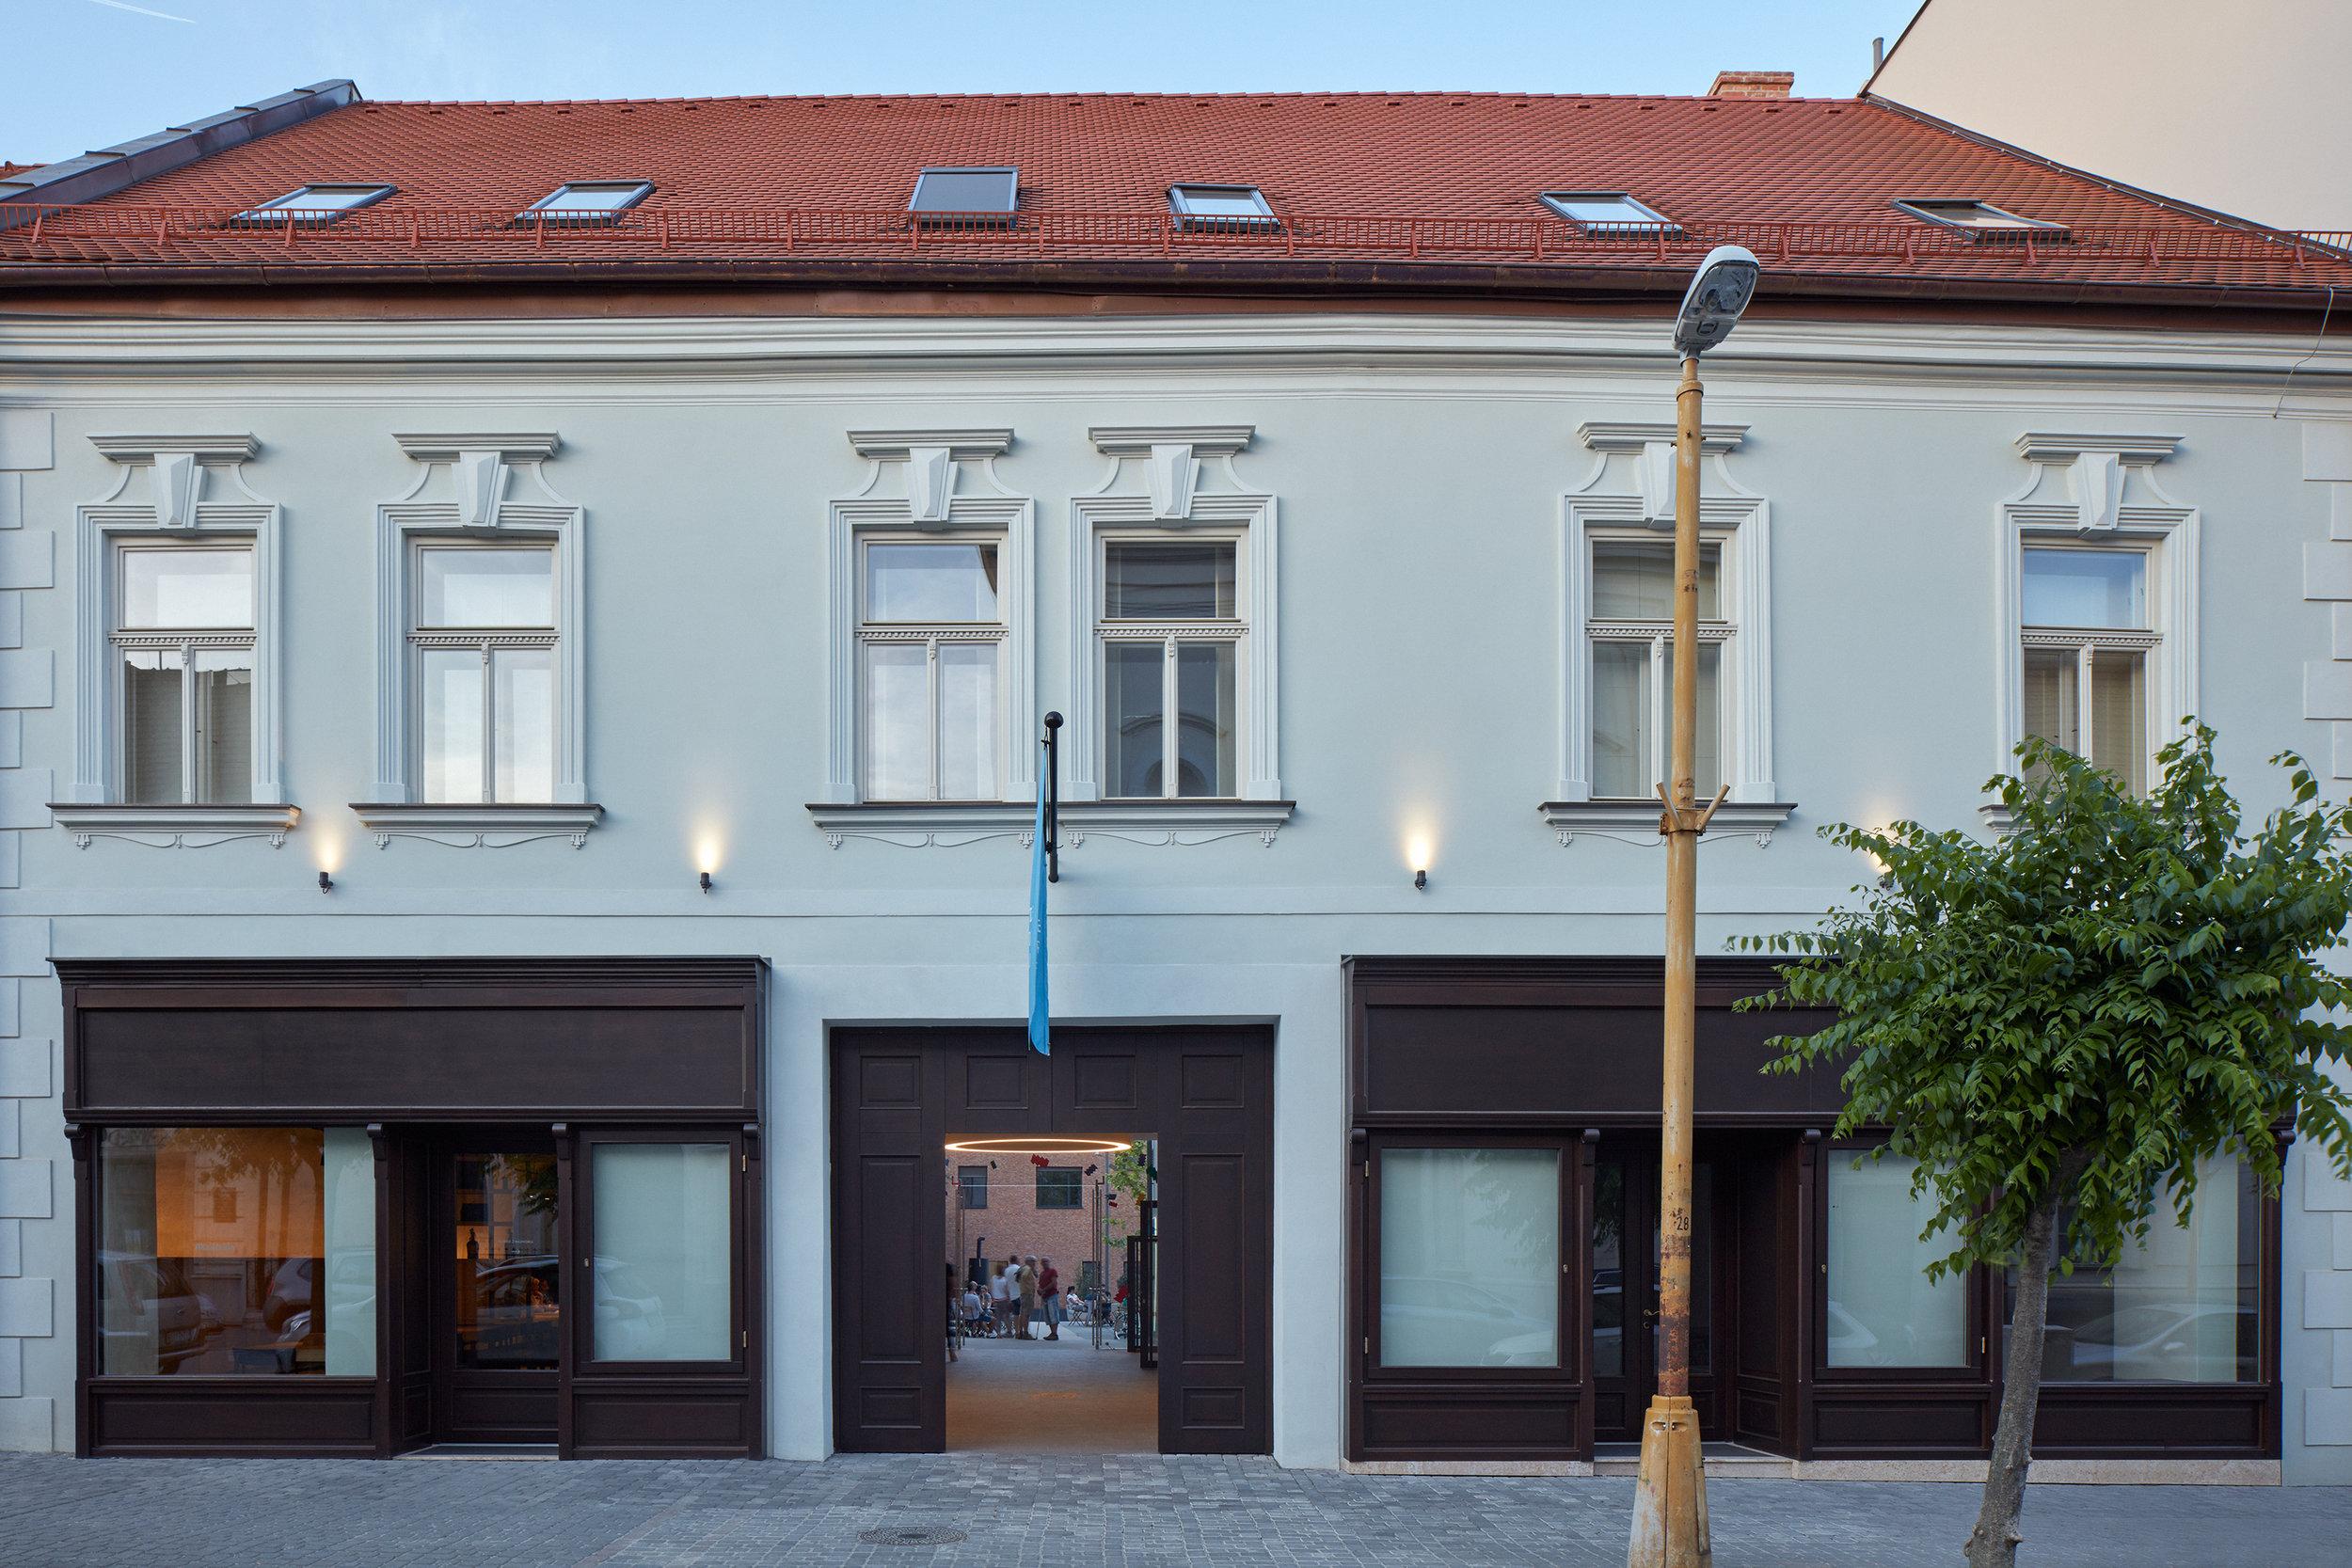 Vallo_Sadovsky_Architects_Nadvorie_BoysPlayNice_50.jpg